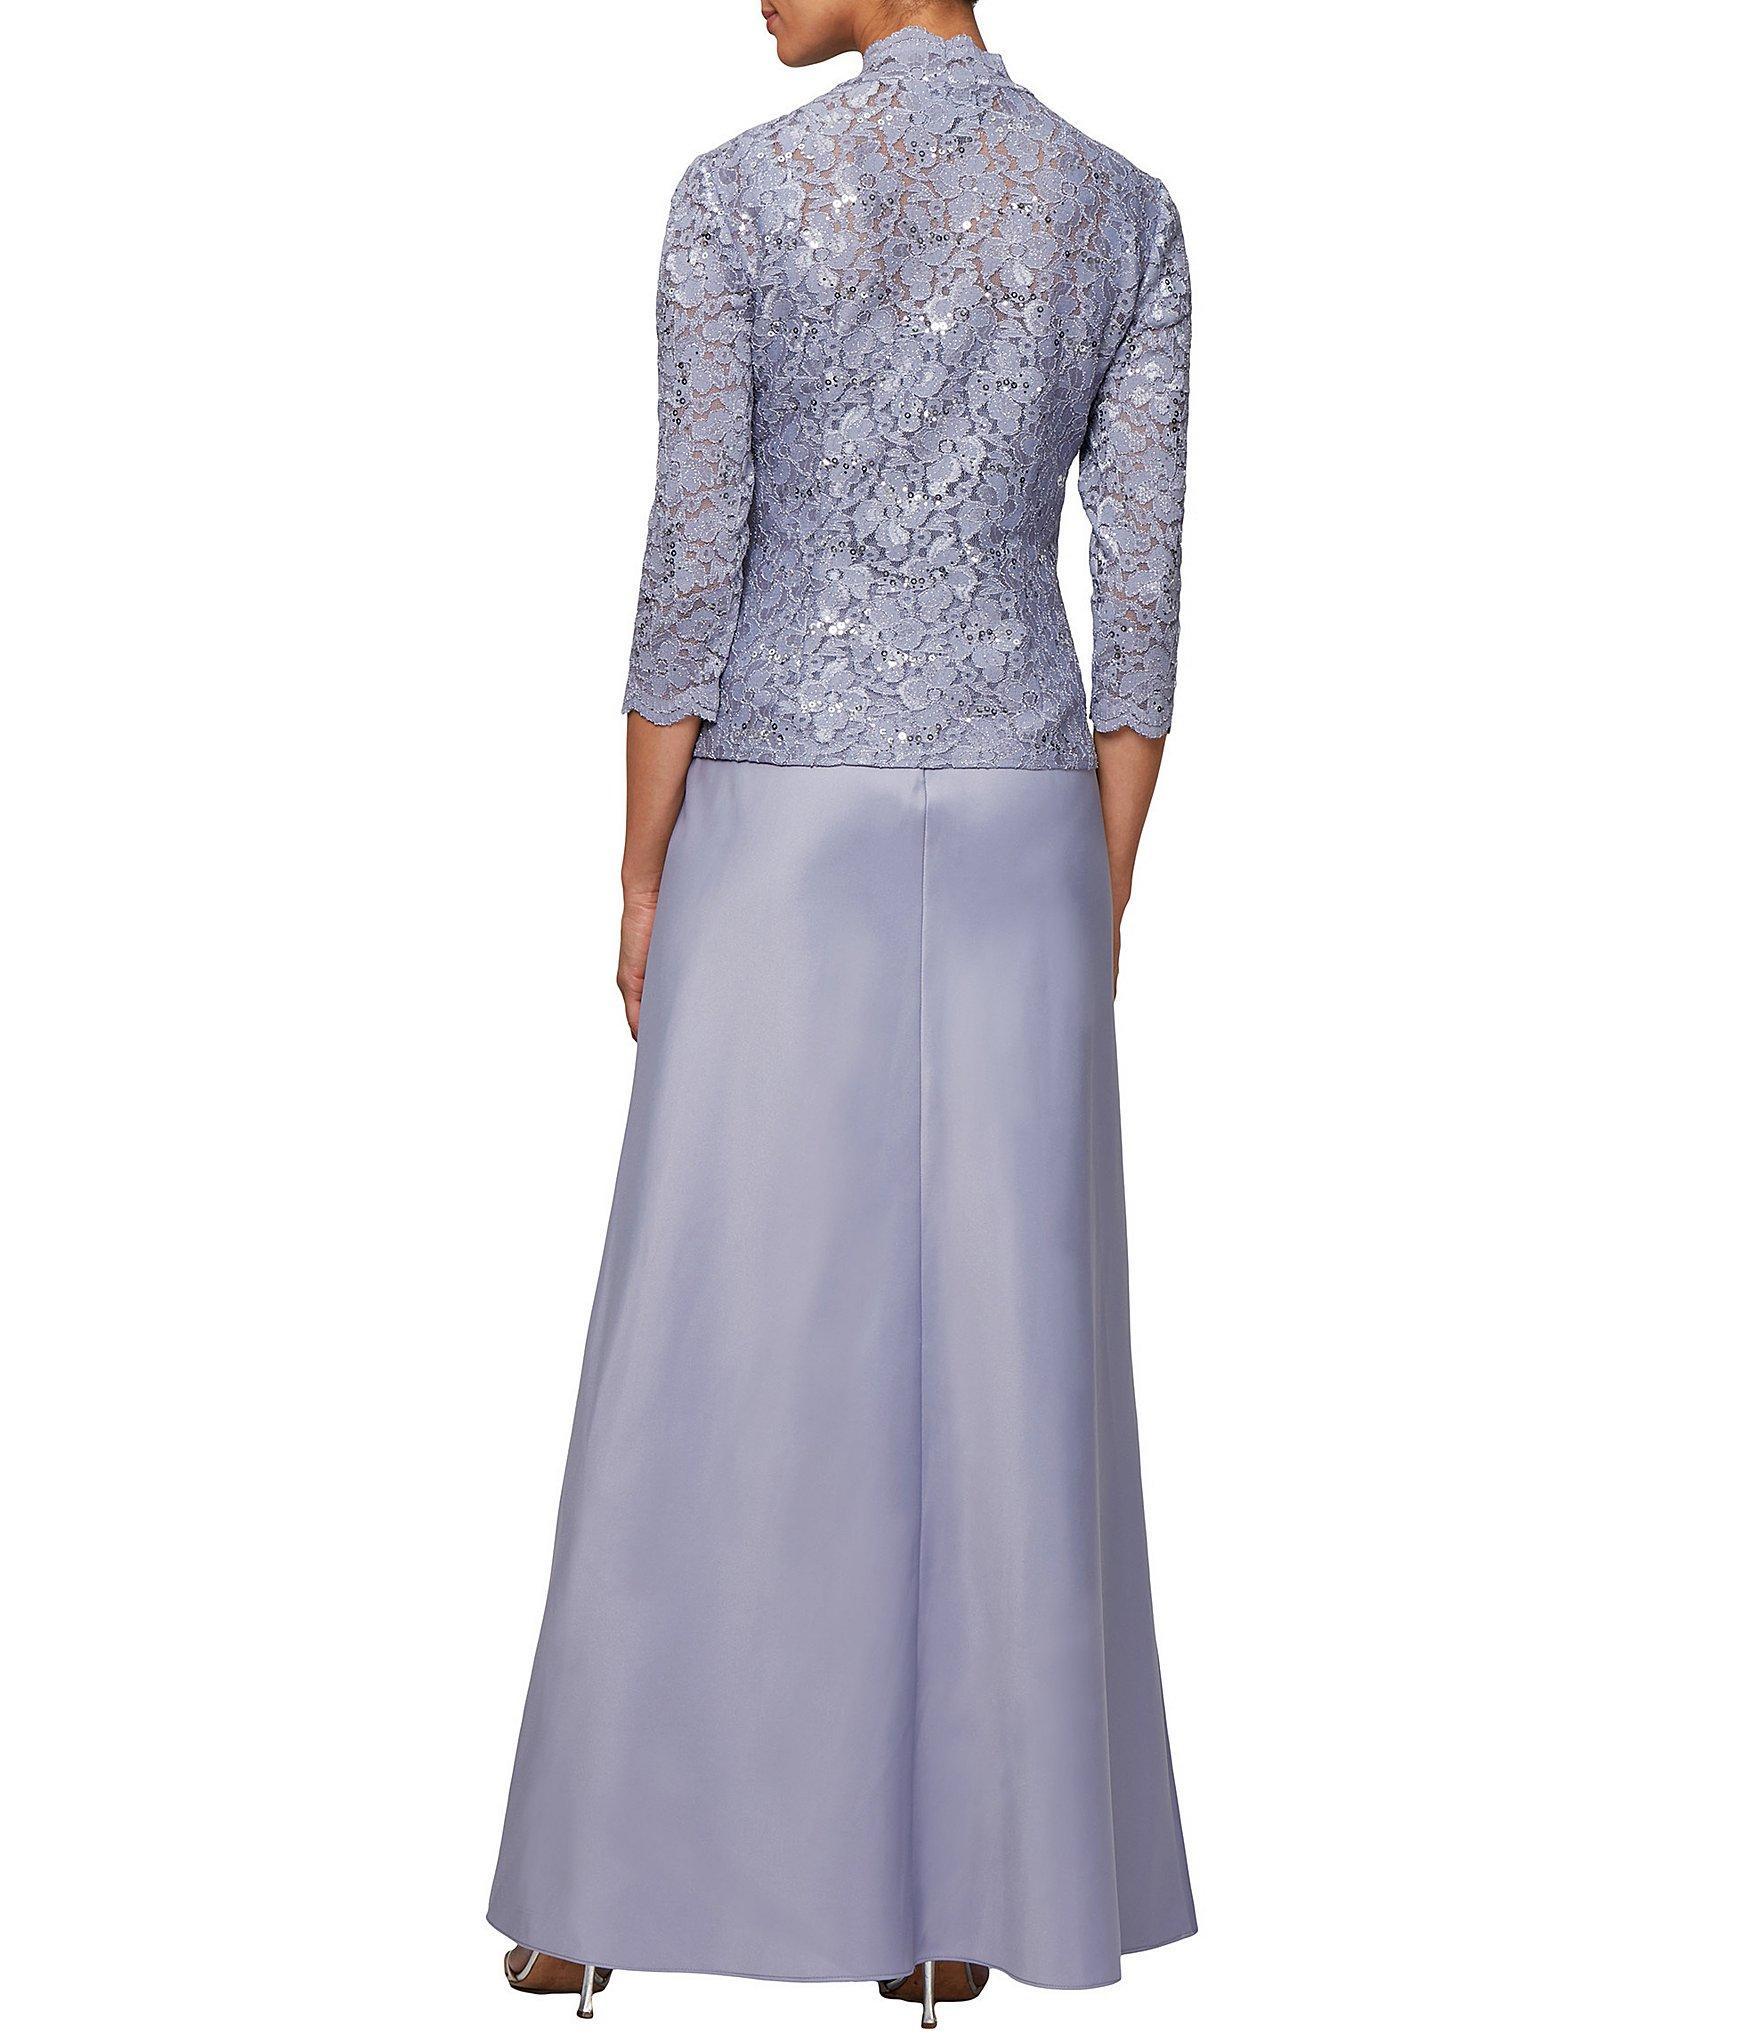 a2eeed9597a Alex Evenings - Purple Petite Size 2-piece Lace Long Jacket Dress - Lyst.  View fullscreen